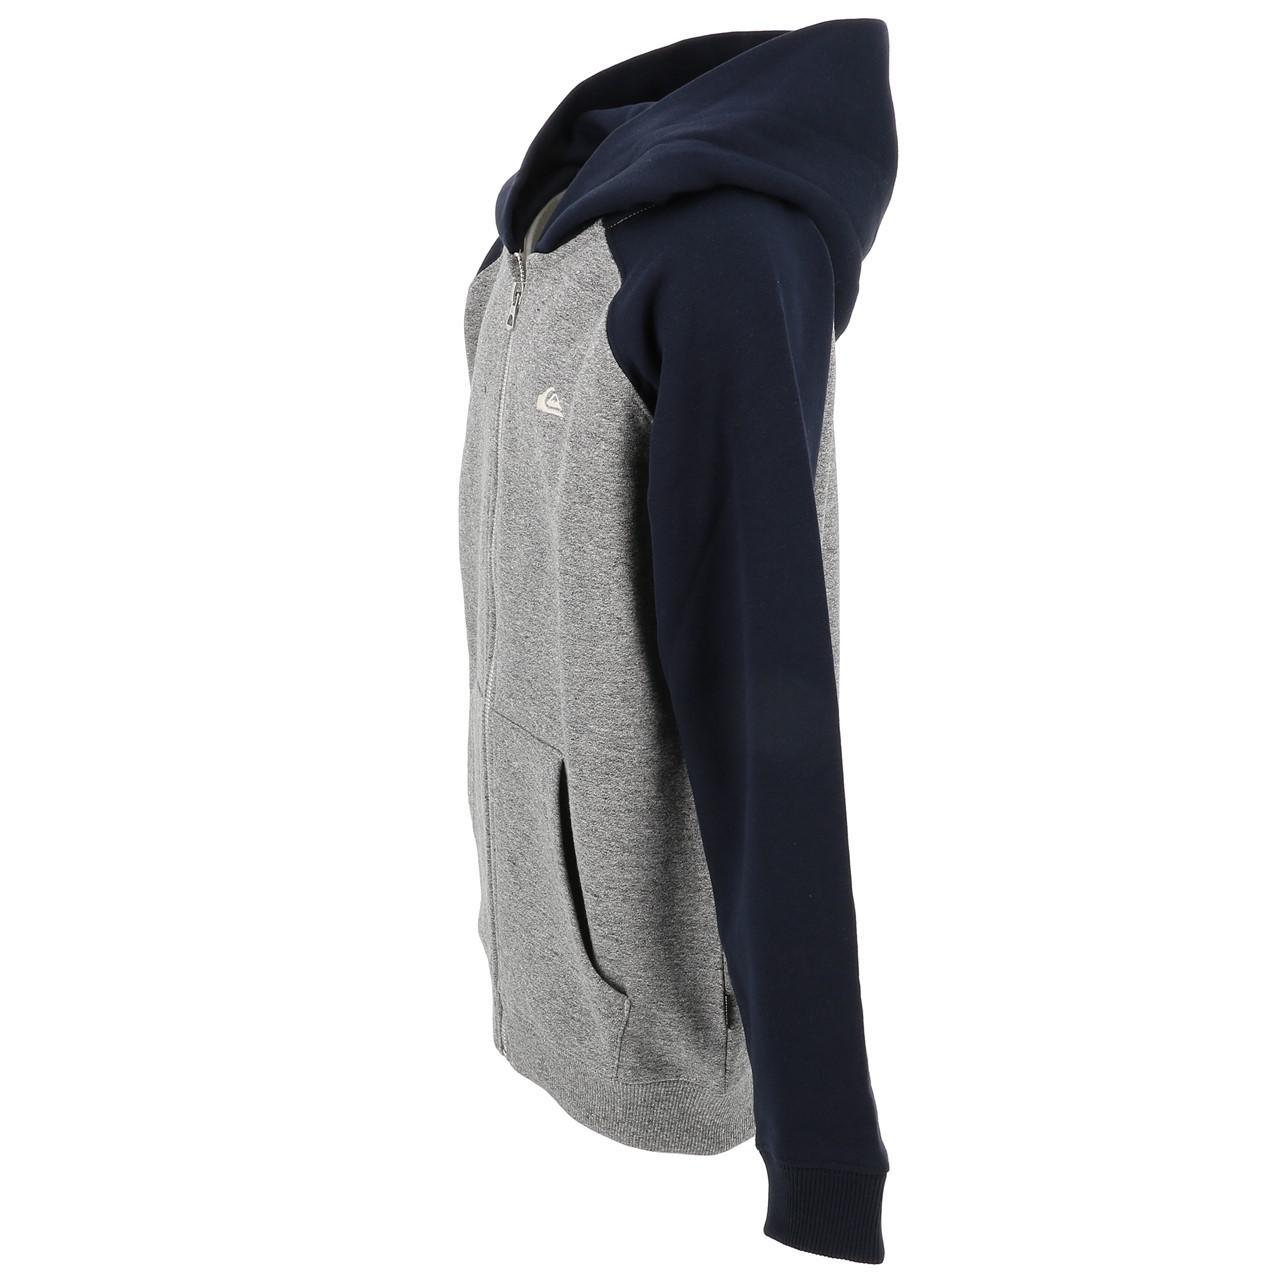 Jacken-Sweatshirts-Zipped-Kapuze-Quiksilver-Everyday-Grc-Fz-Umhang-Sw-Jr-Grau Indexbild 4